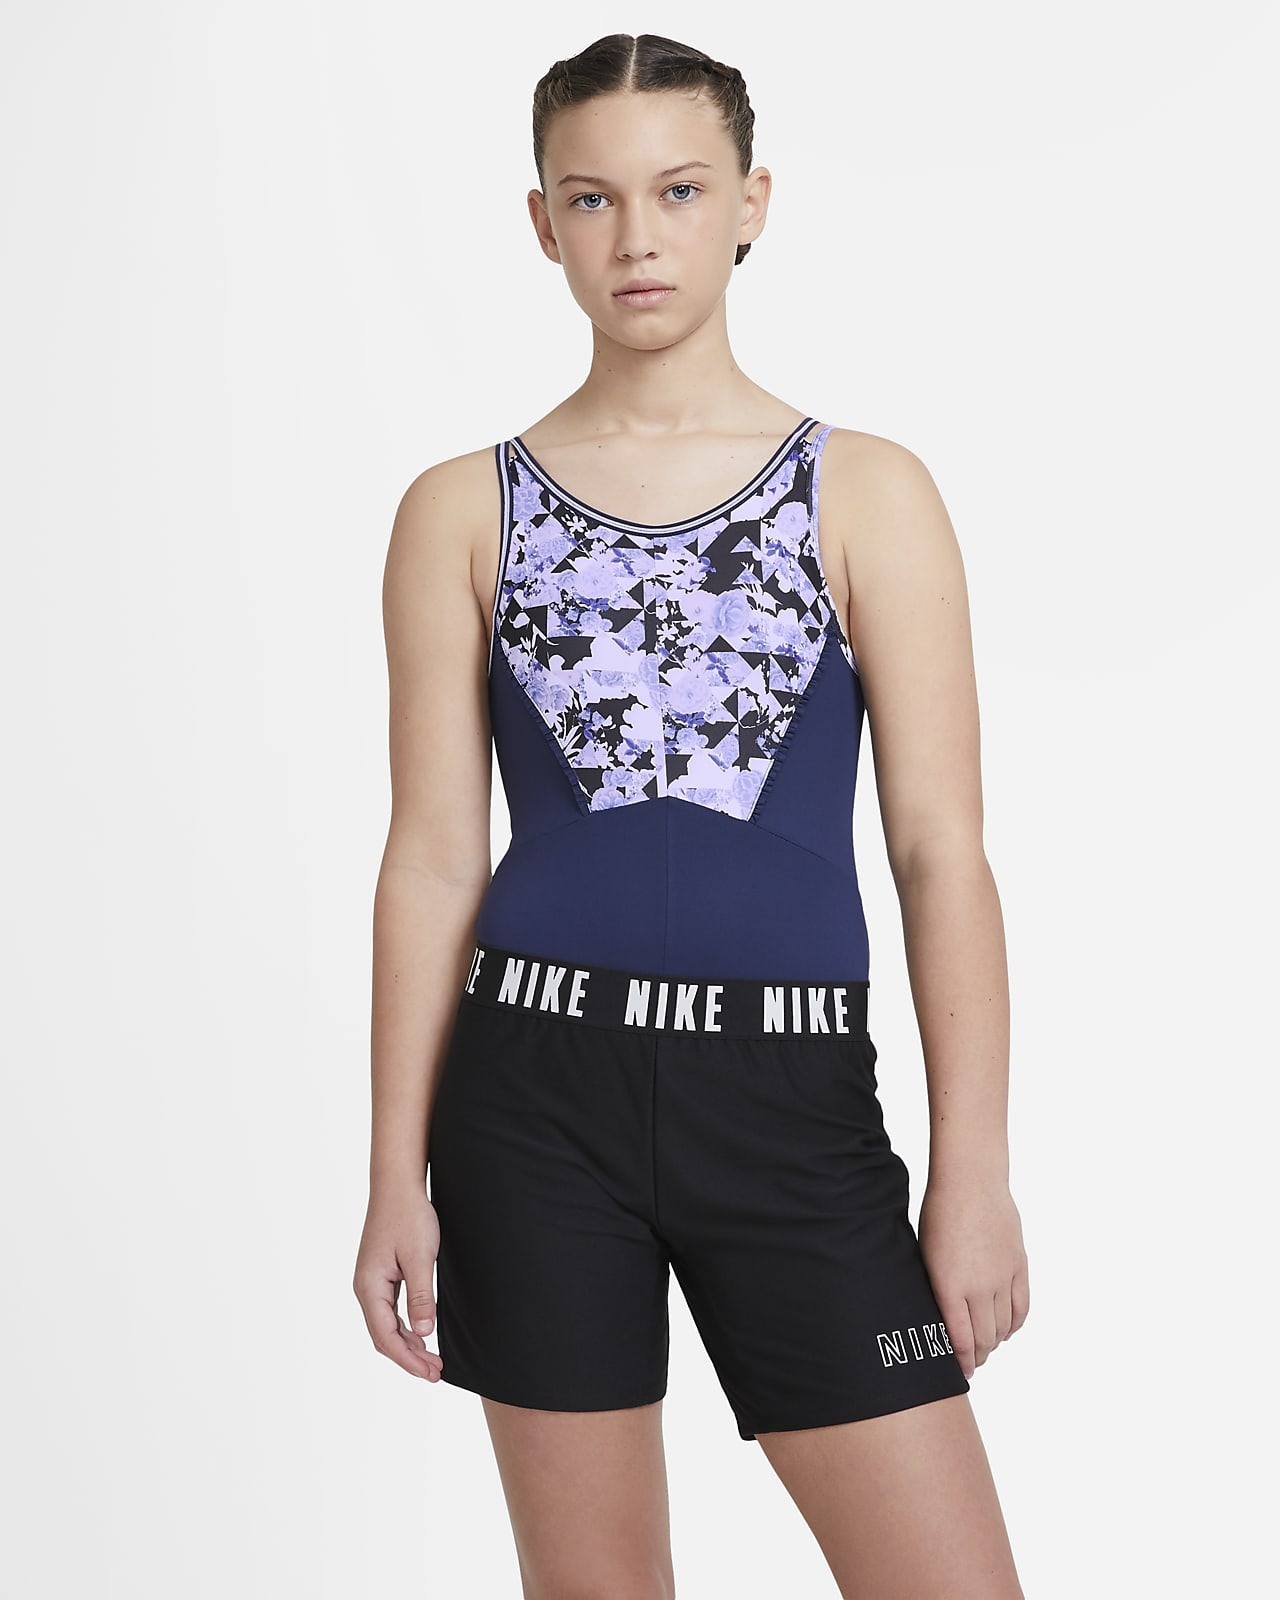 Nike Bodysuit für ältere Kinder (Mädchen)